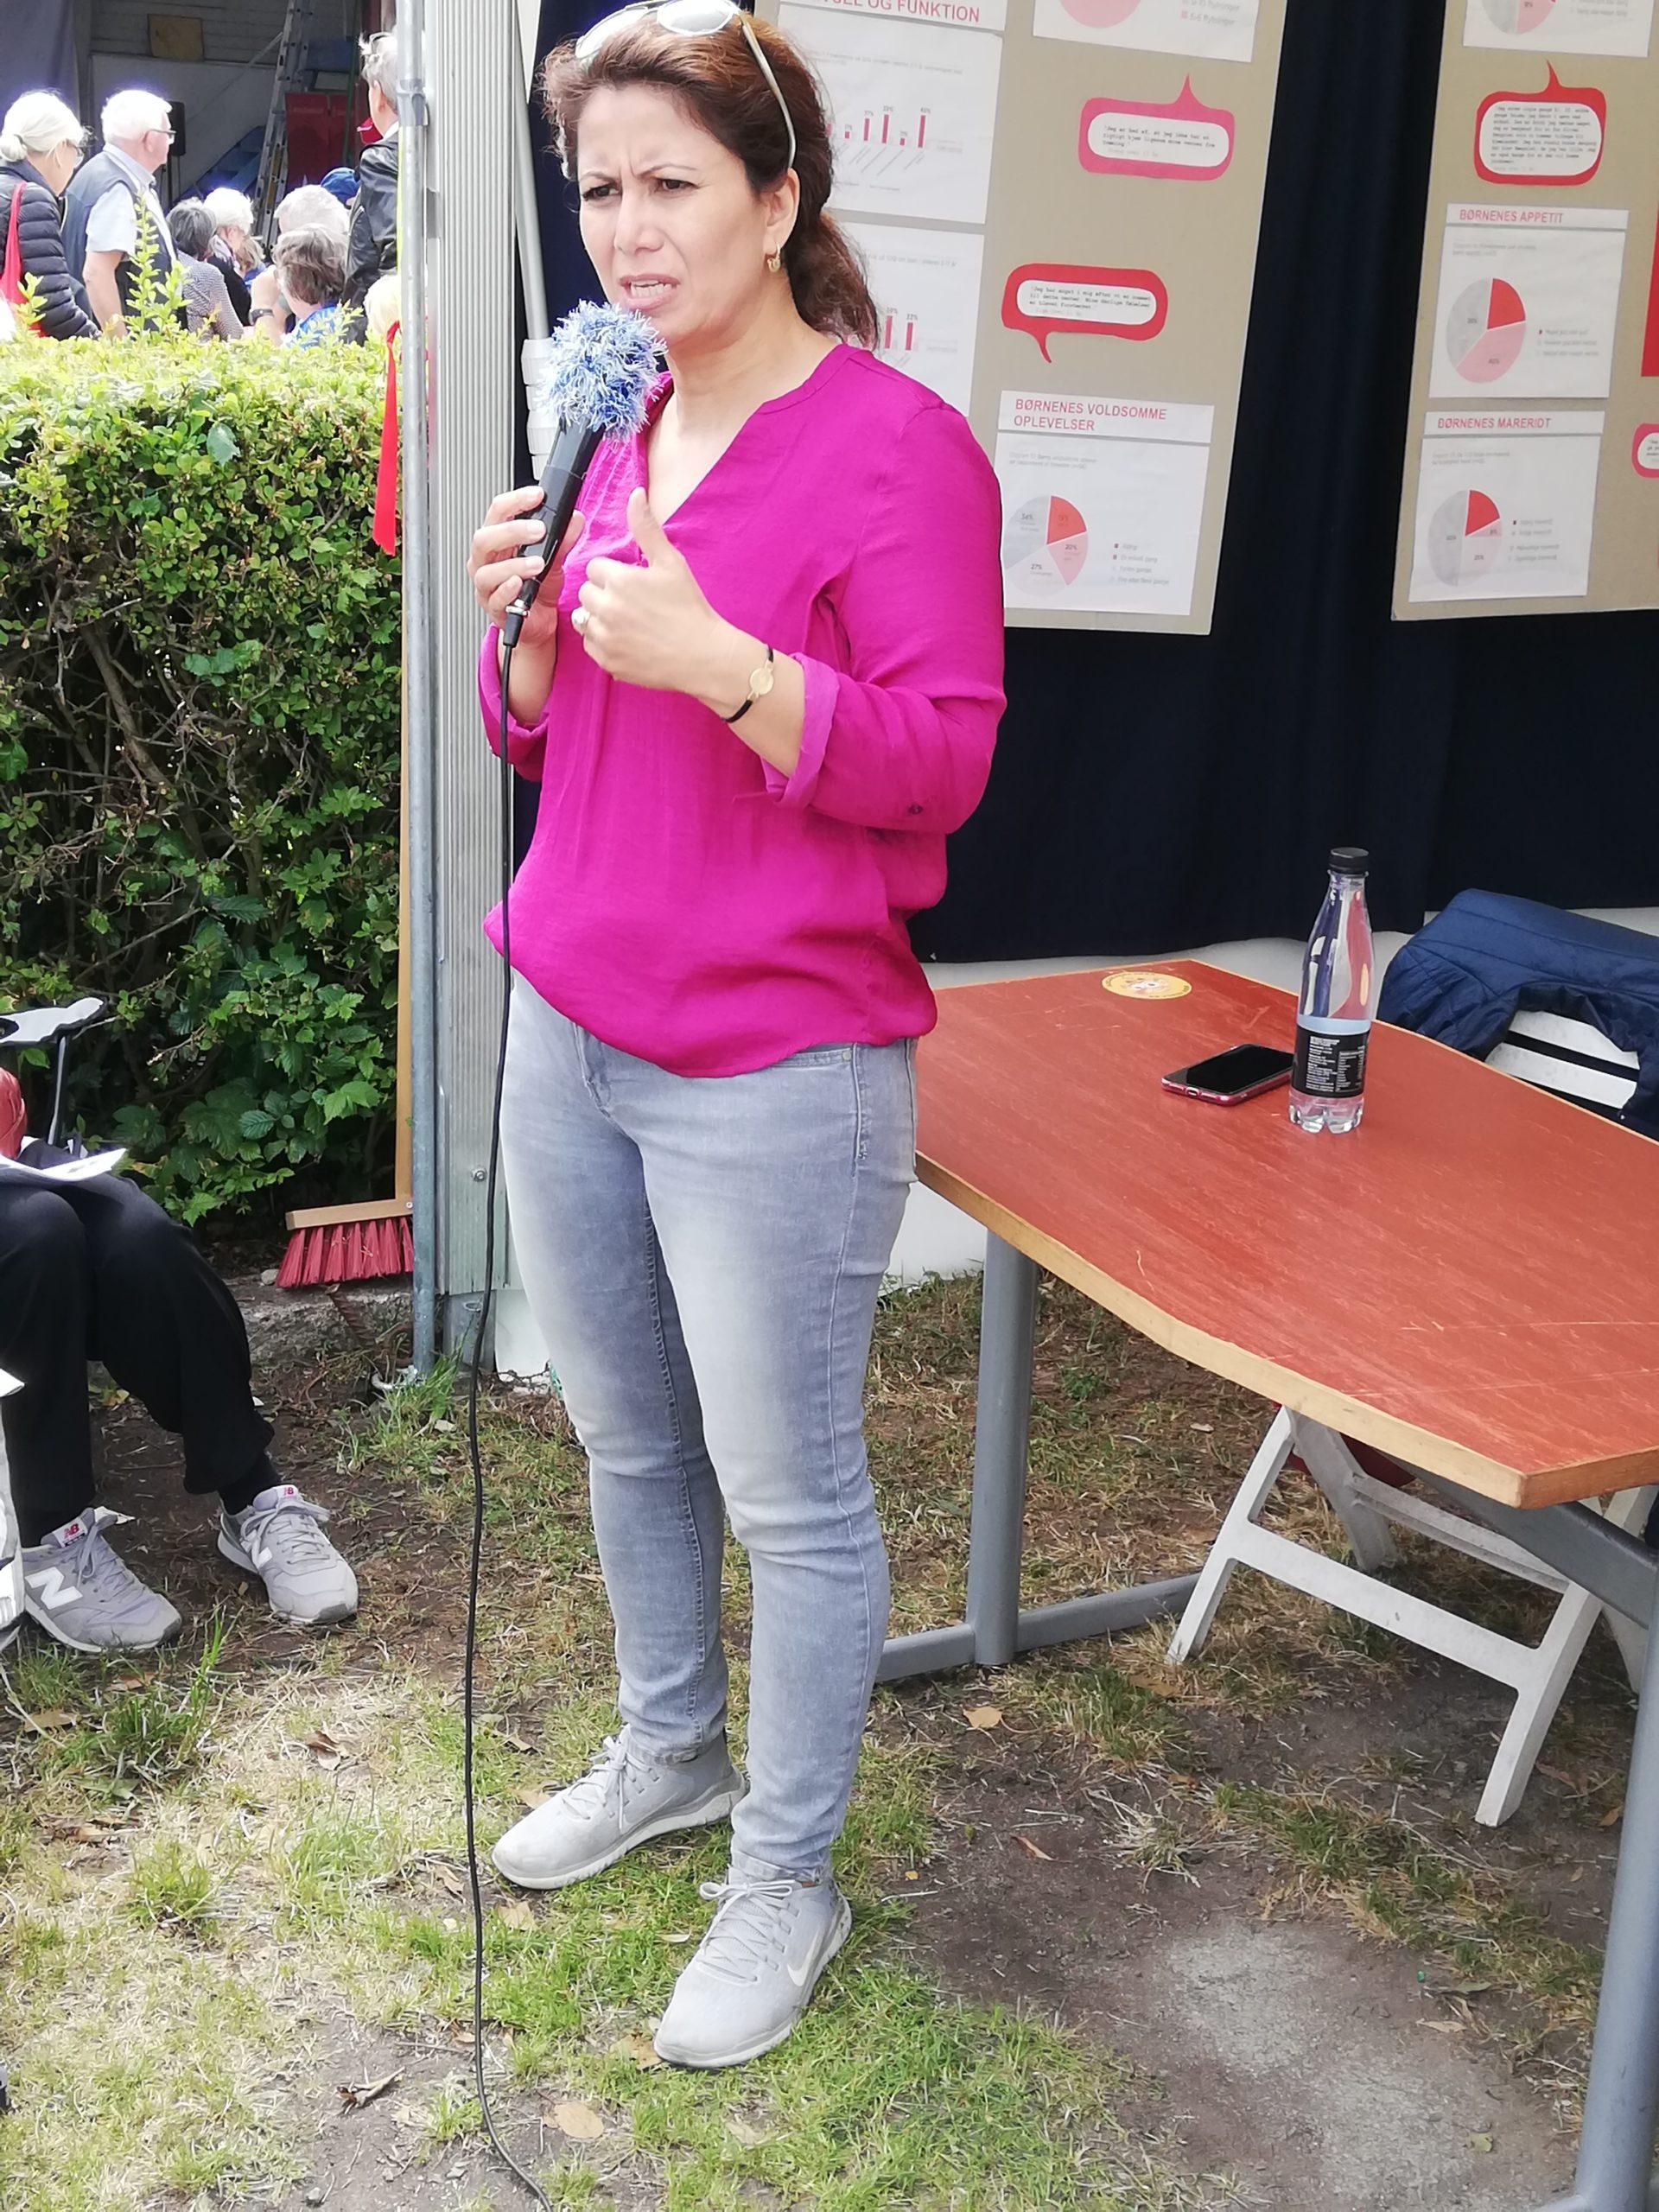 Özlem Cekic hos om brobyggererfaringerorældre for Asyl